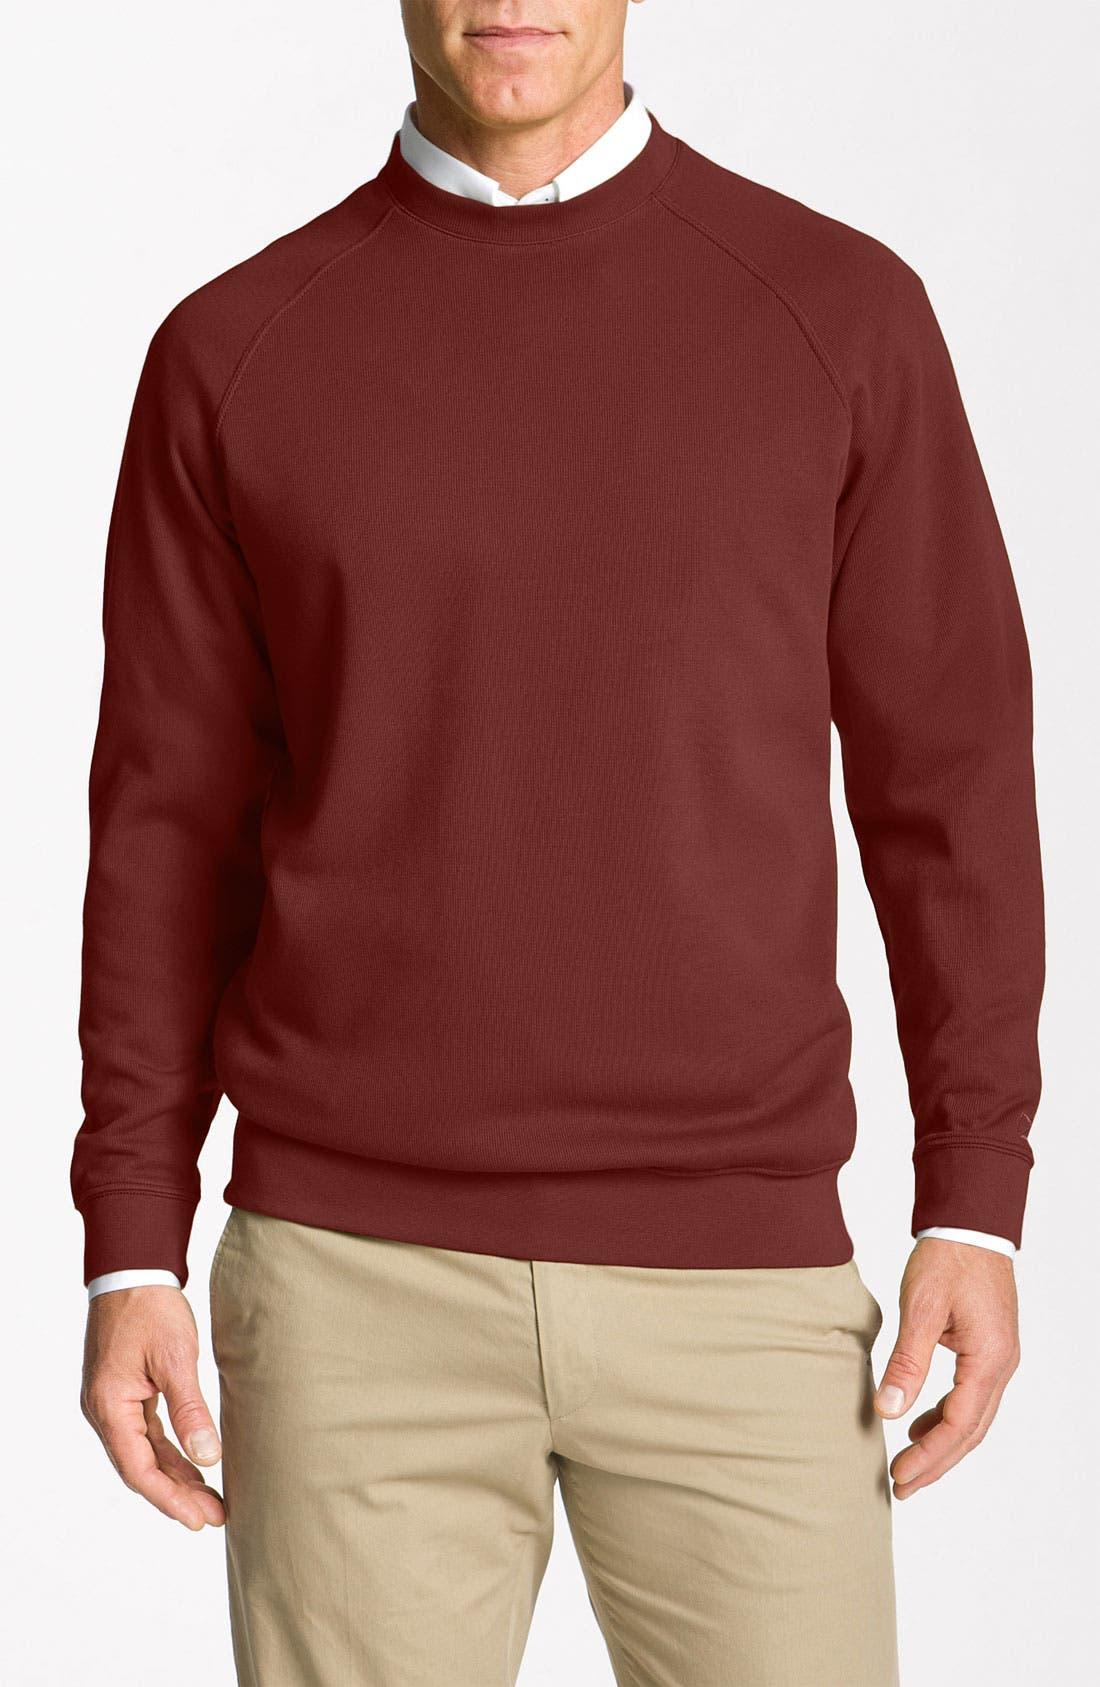 Main Image - Cutter & Buck 'Canoe Ridge' Crewneck Sweater (Online Exclusive)